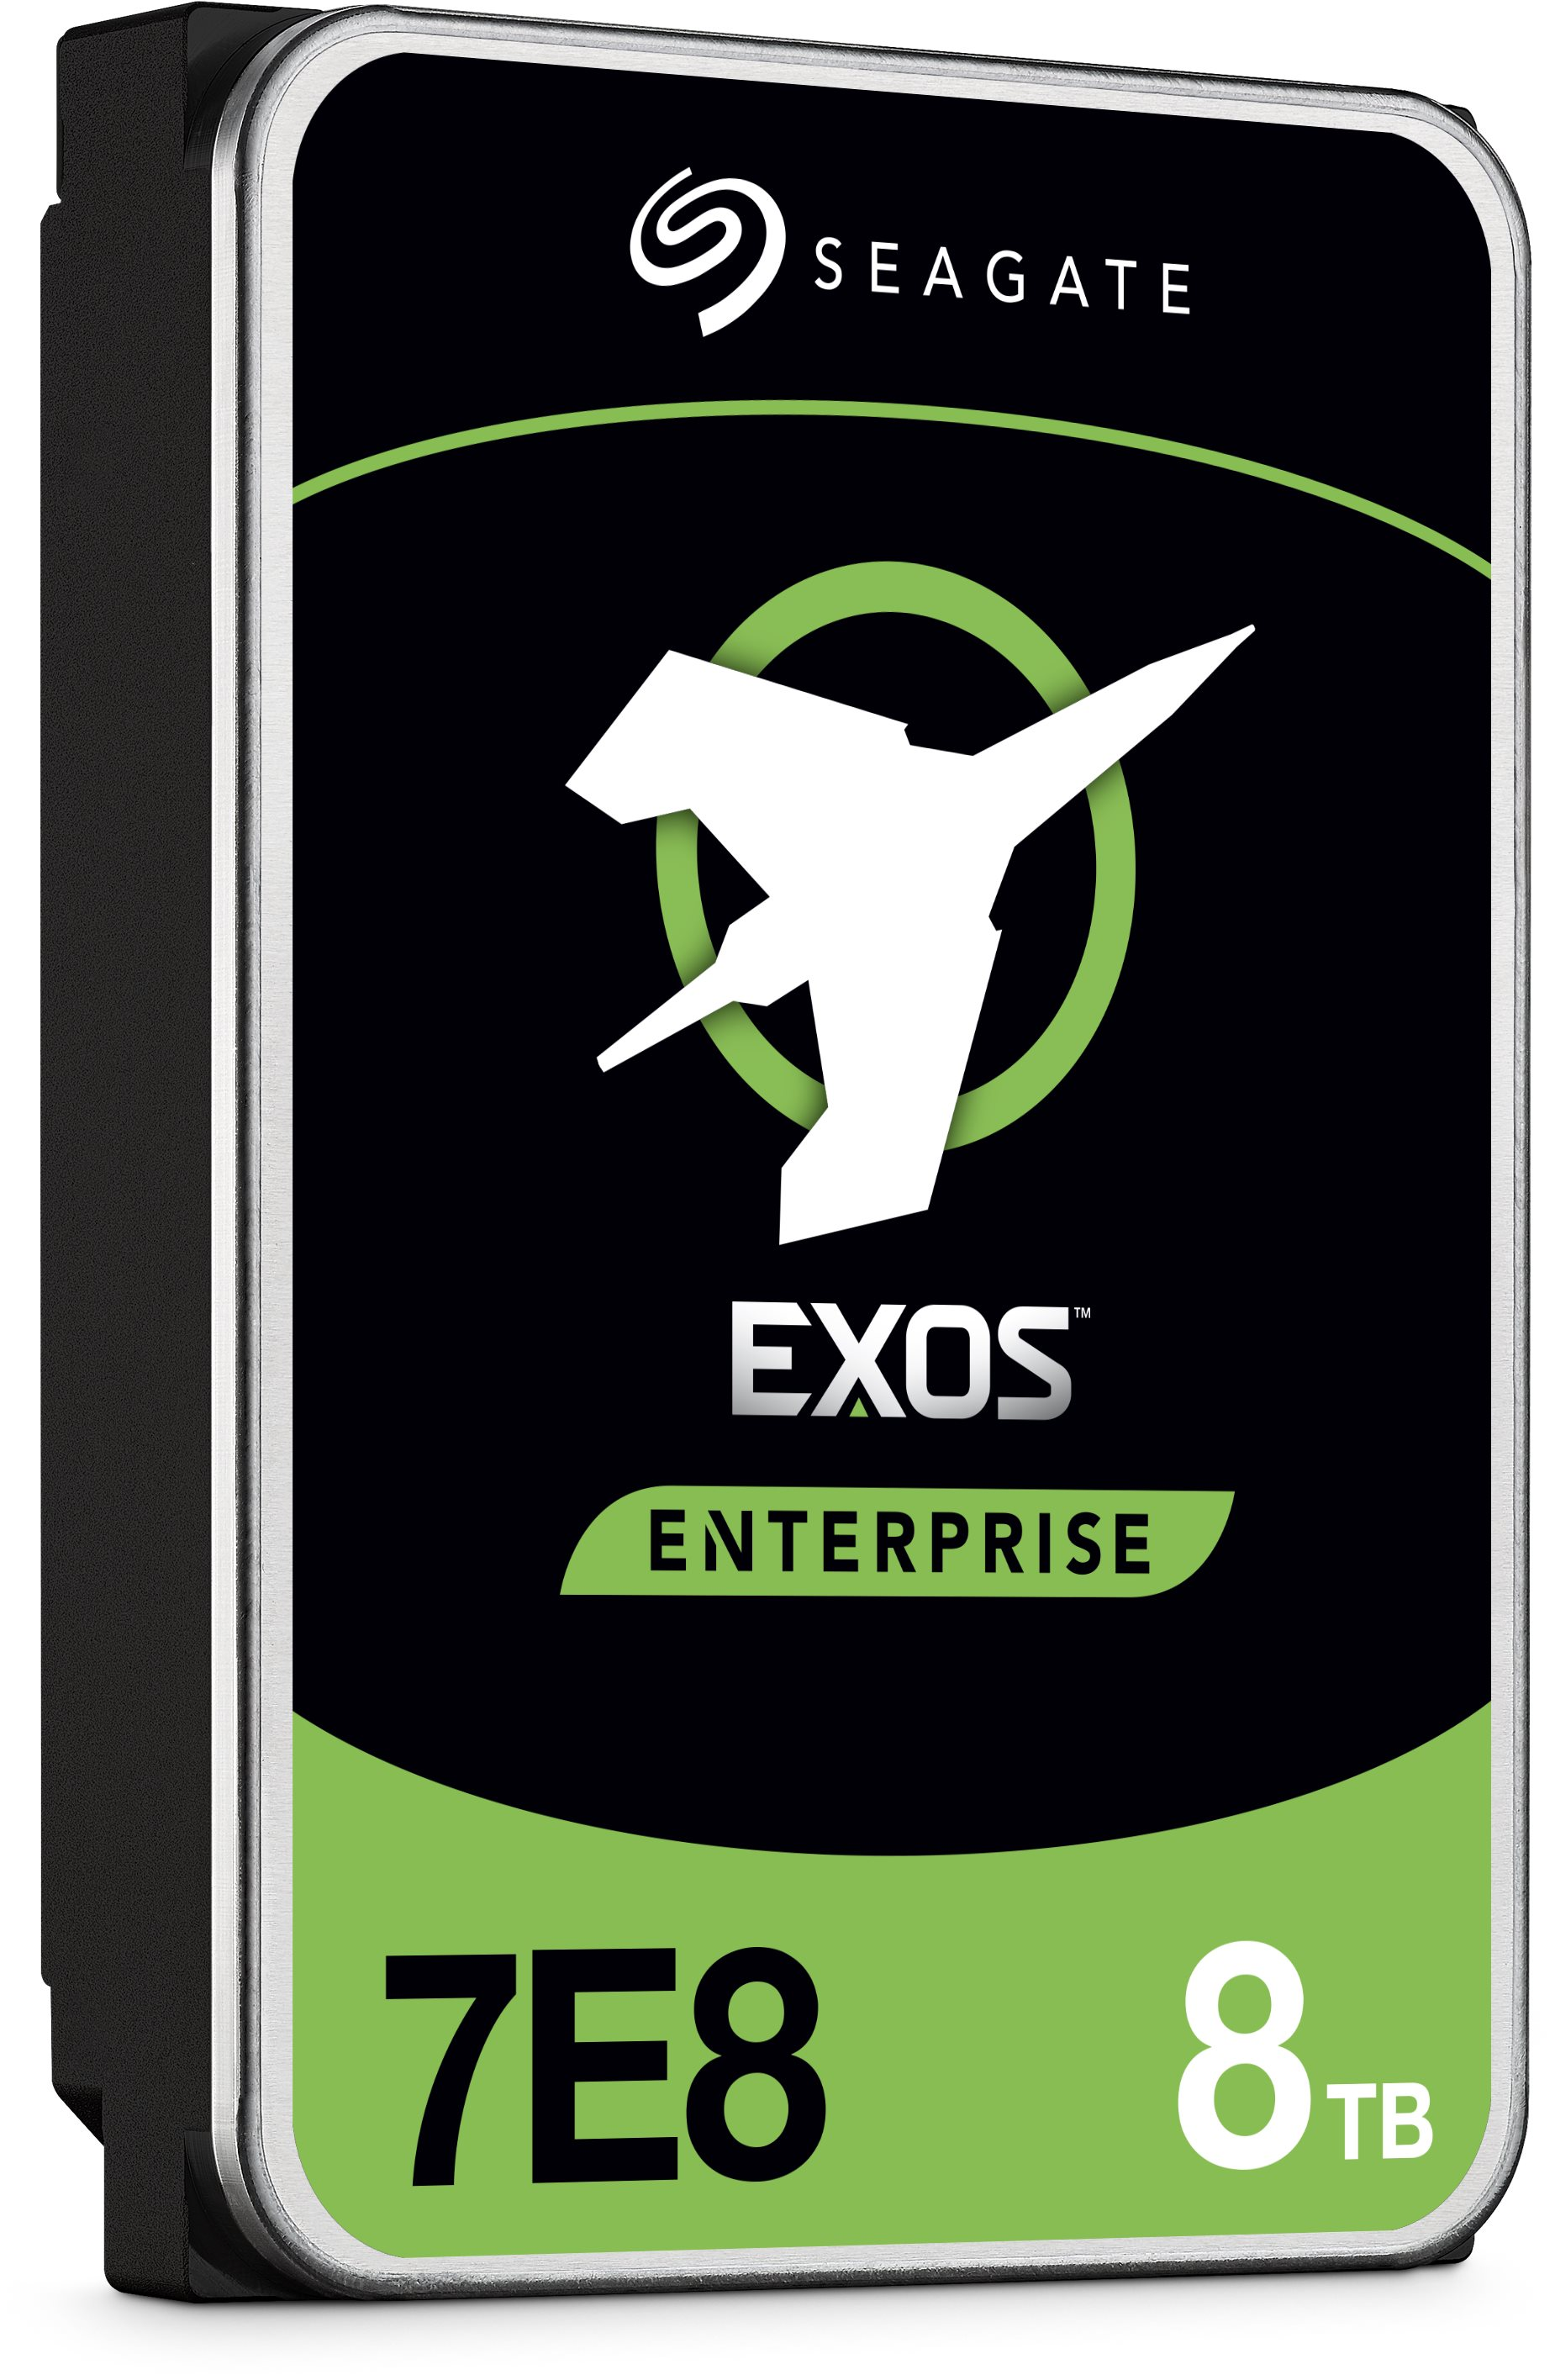 Seagate Exos 7E8 8TB Base FastFormat SATA